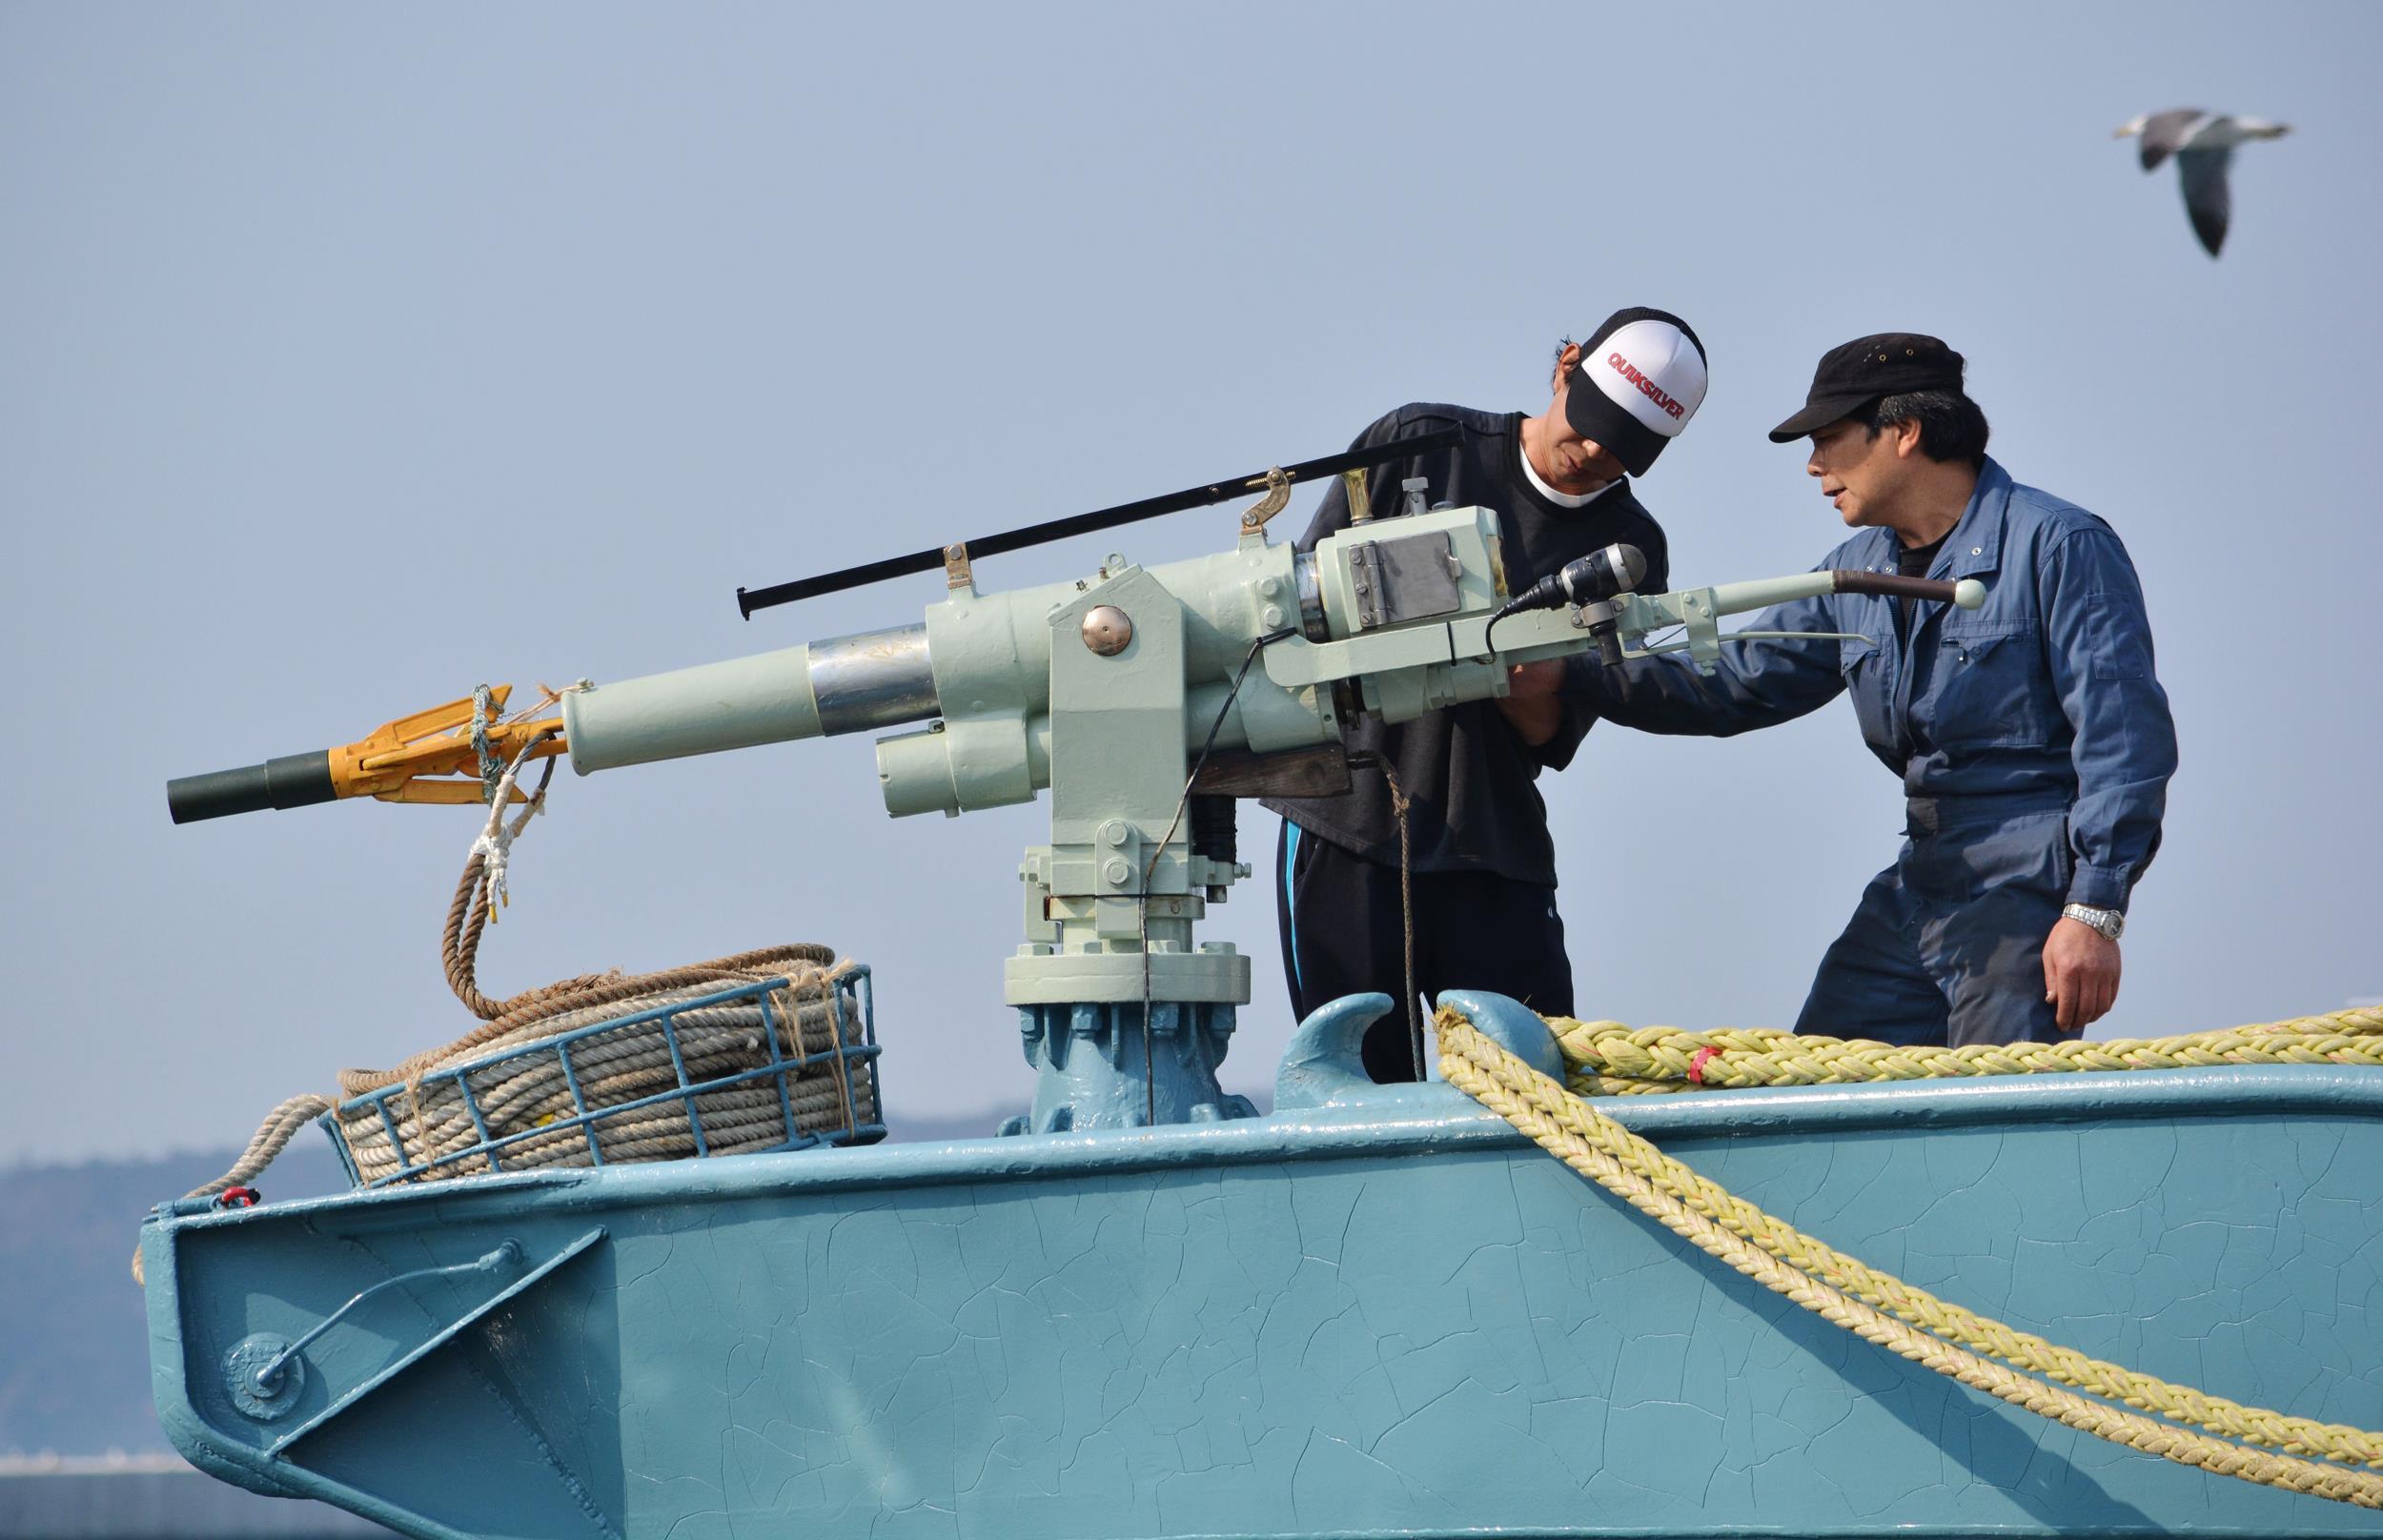 Image: Crew of a whaling ship check a whaling gun